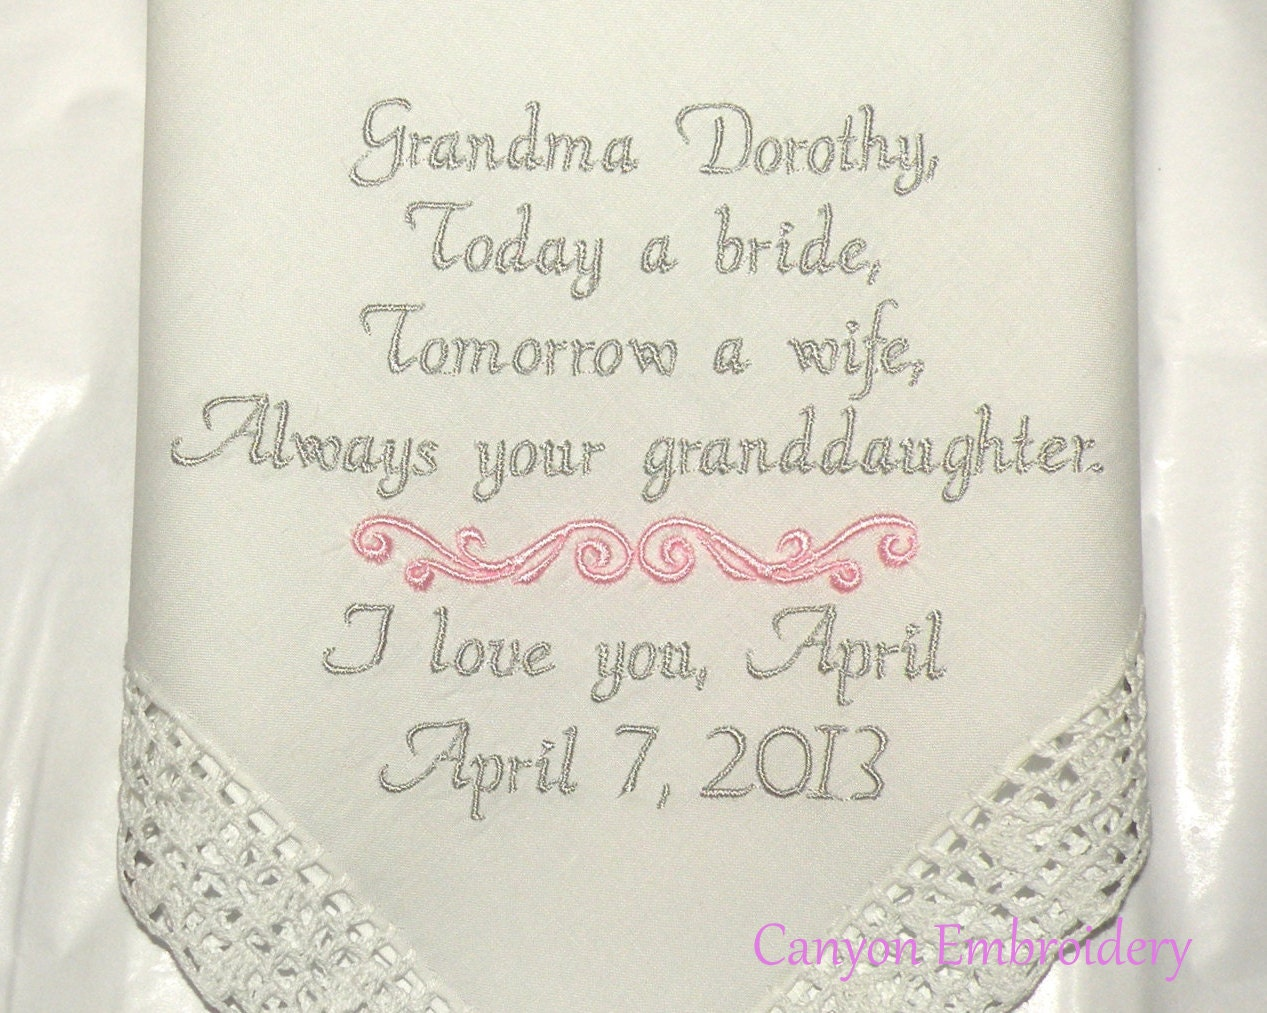 Grandmother Wedding Gift: Grandmother Gift Personalized Embroidered Wedding Hanky